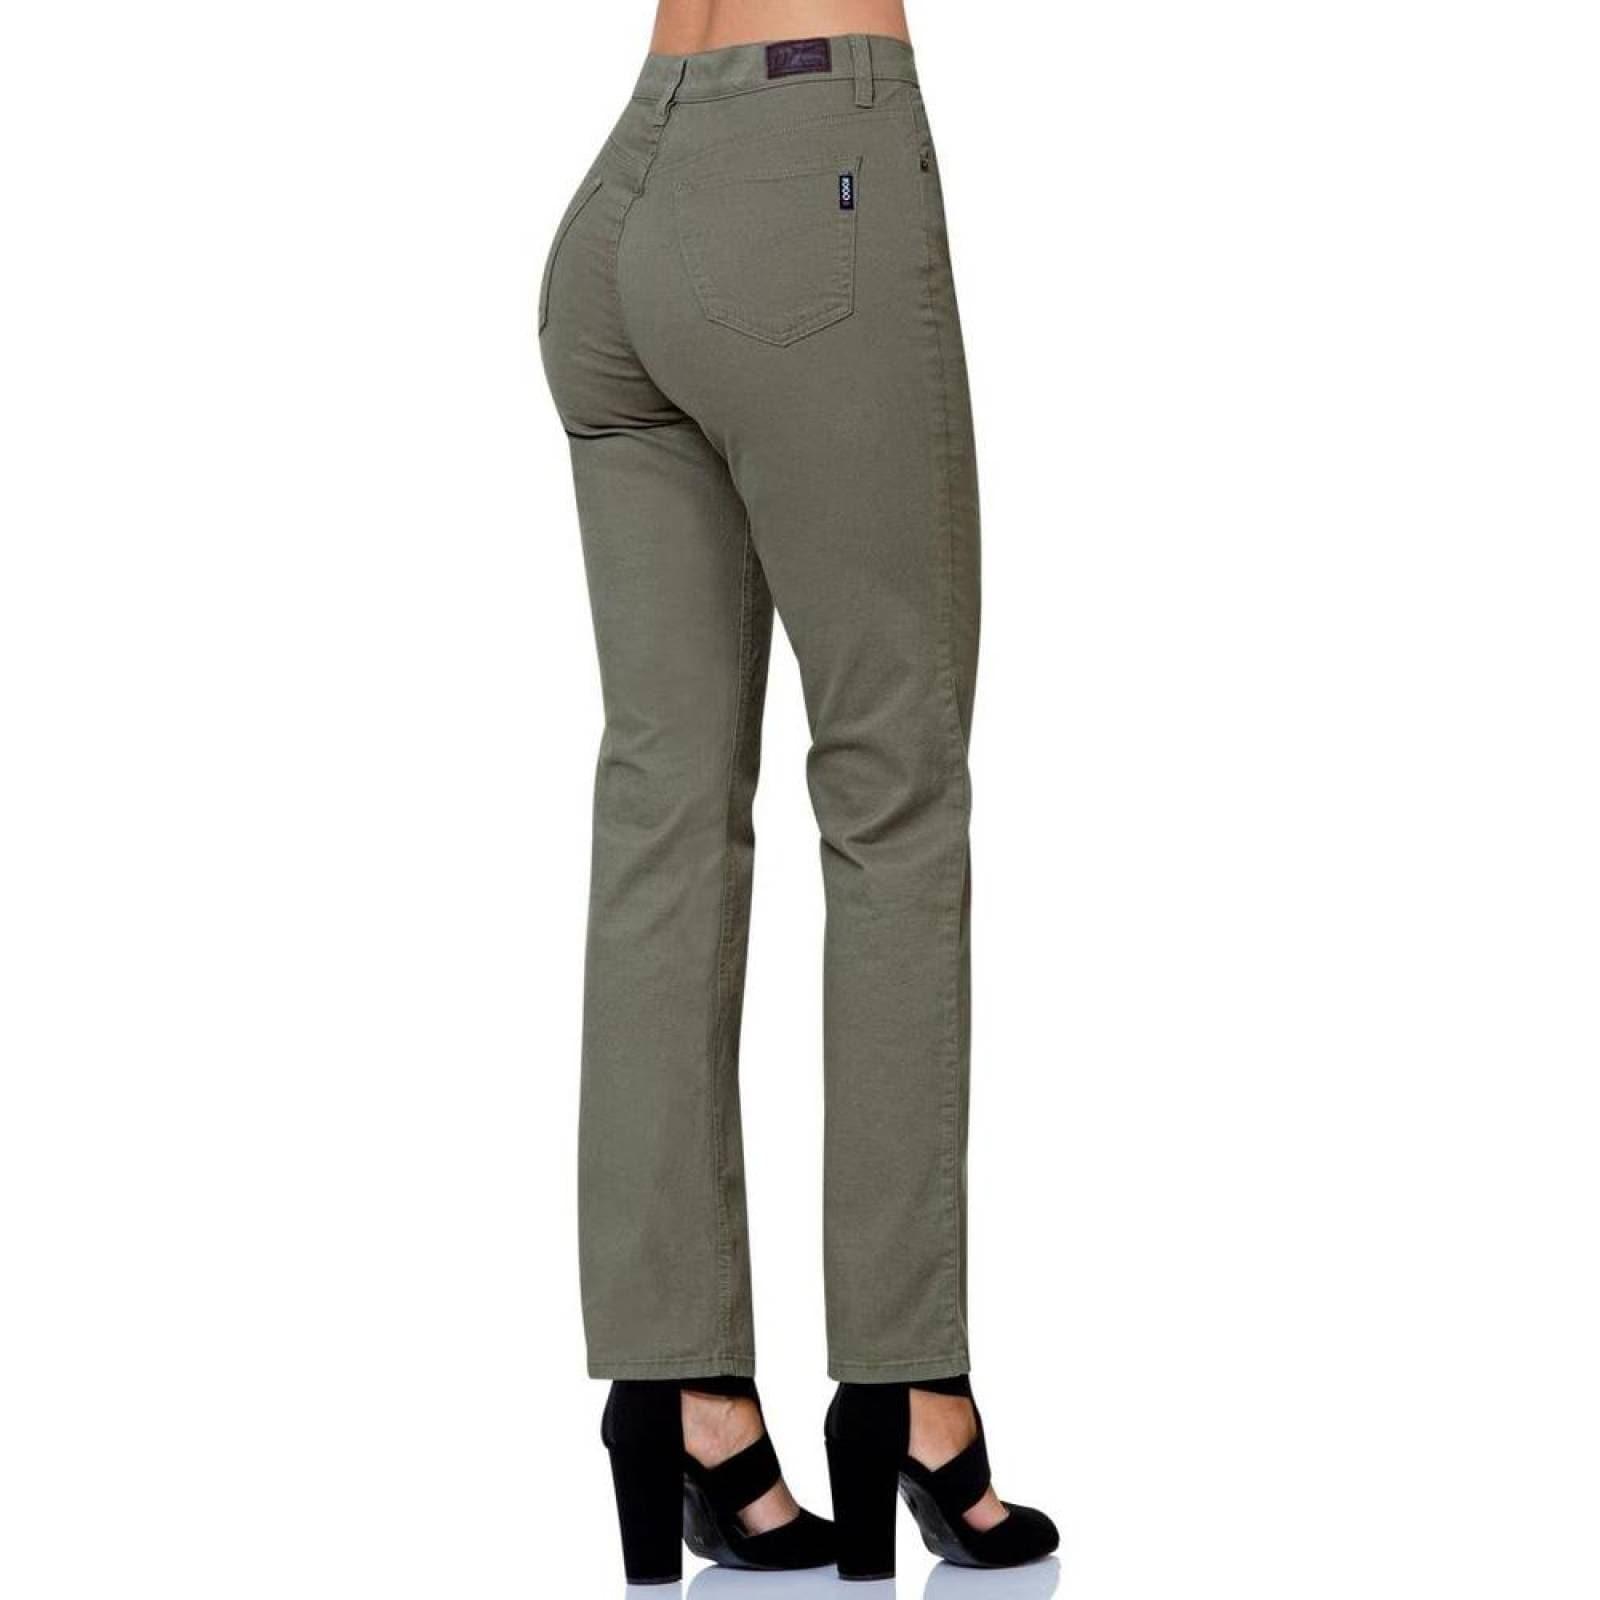 Pantalon Casual Mujer Oggi Olivo 59102051 Gabardina Stretch